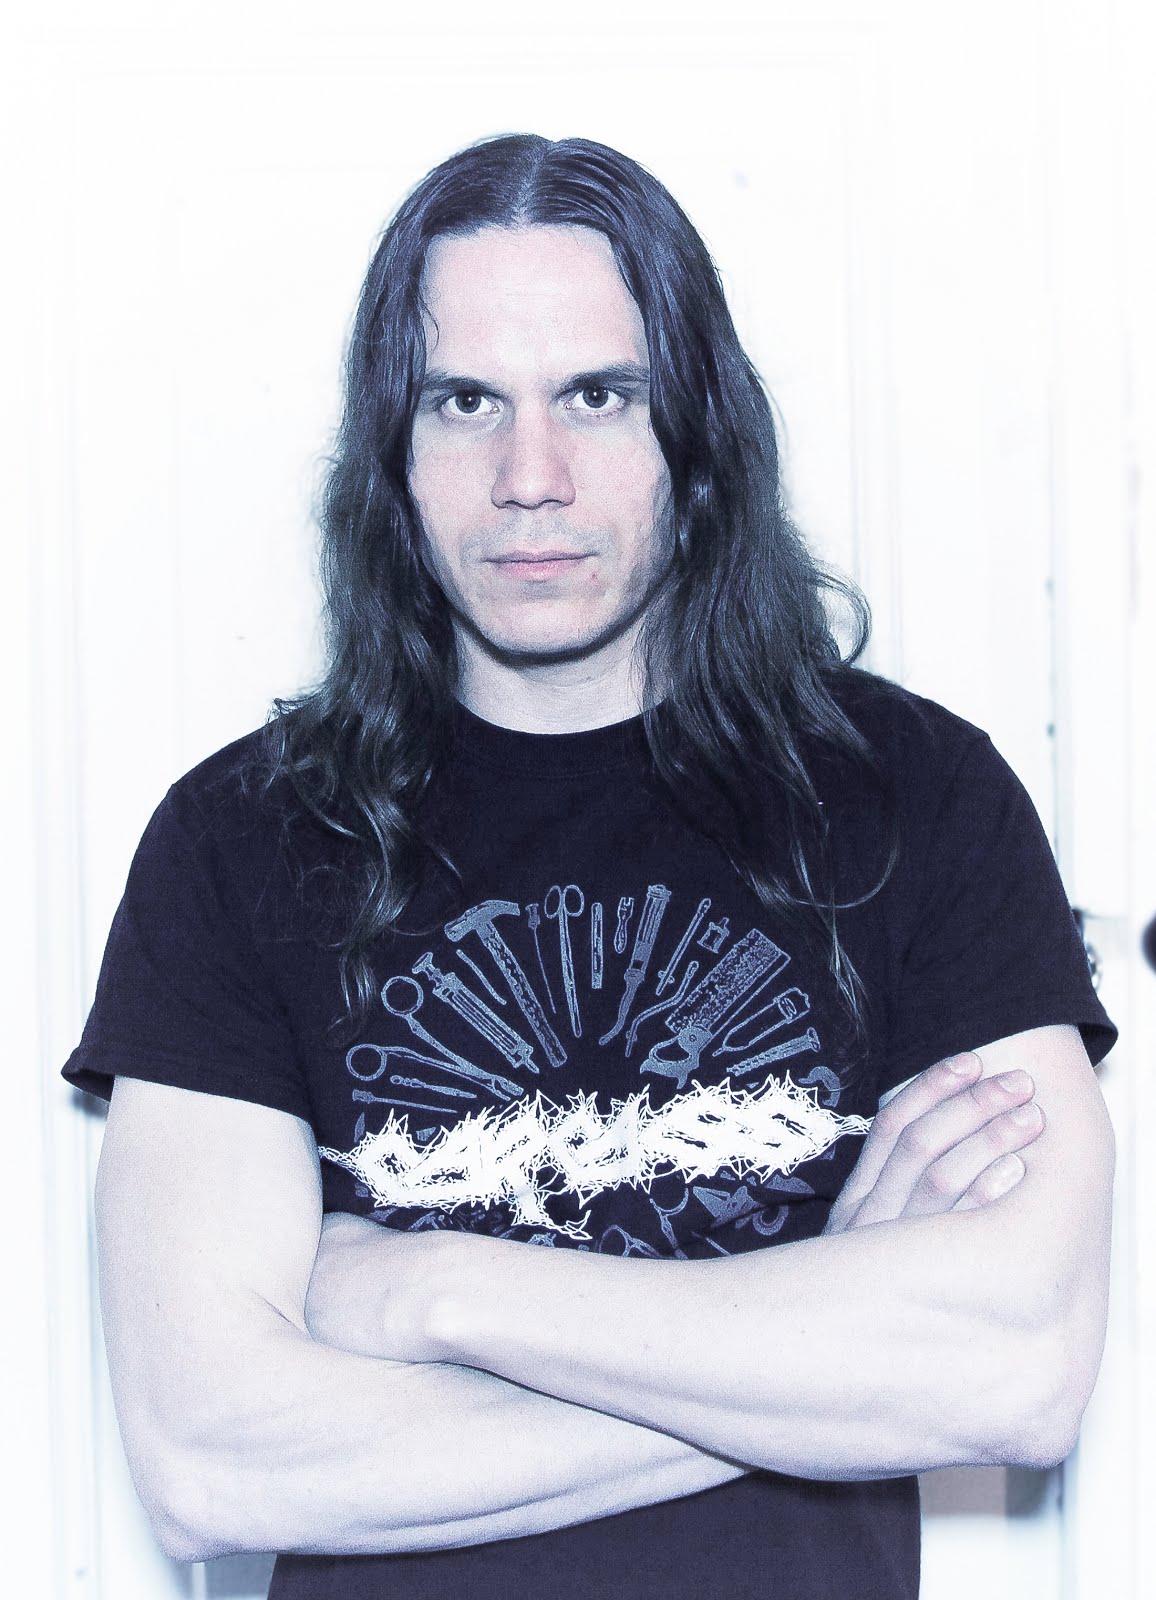 Timo Mikkonen, guitar